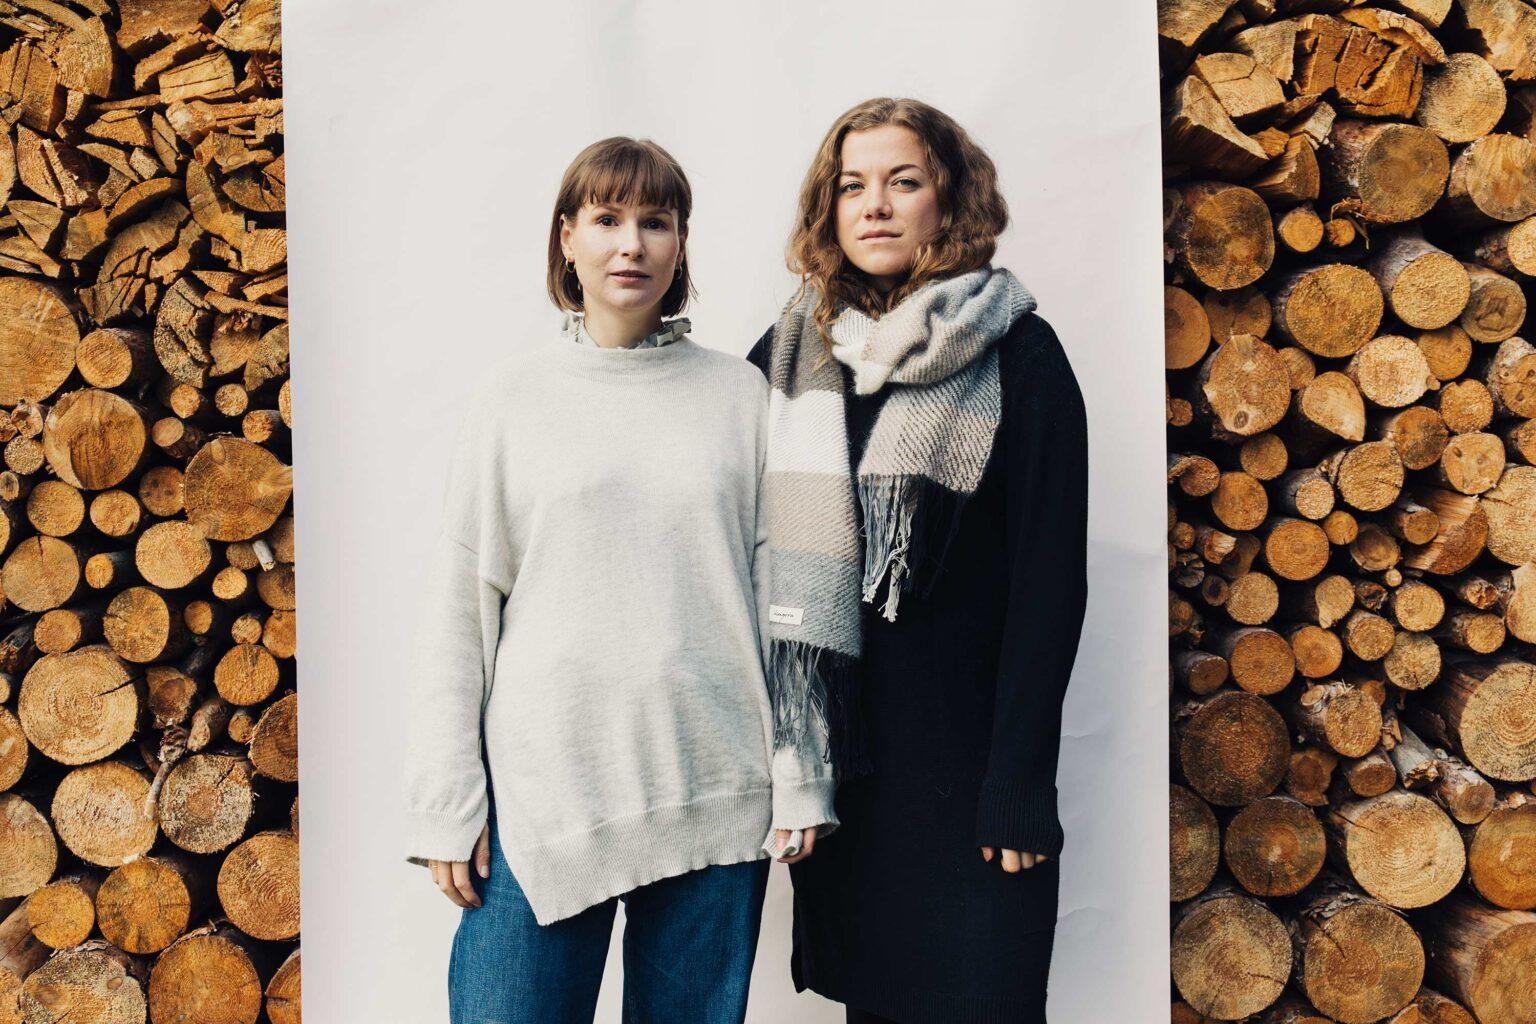 Chiengora Modus Intarsia Start Up Ann Cathrin Schönrock Franziska Uhl Hundewolle Nachhaltige Mode